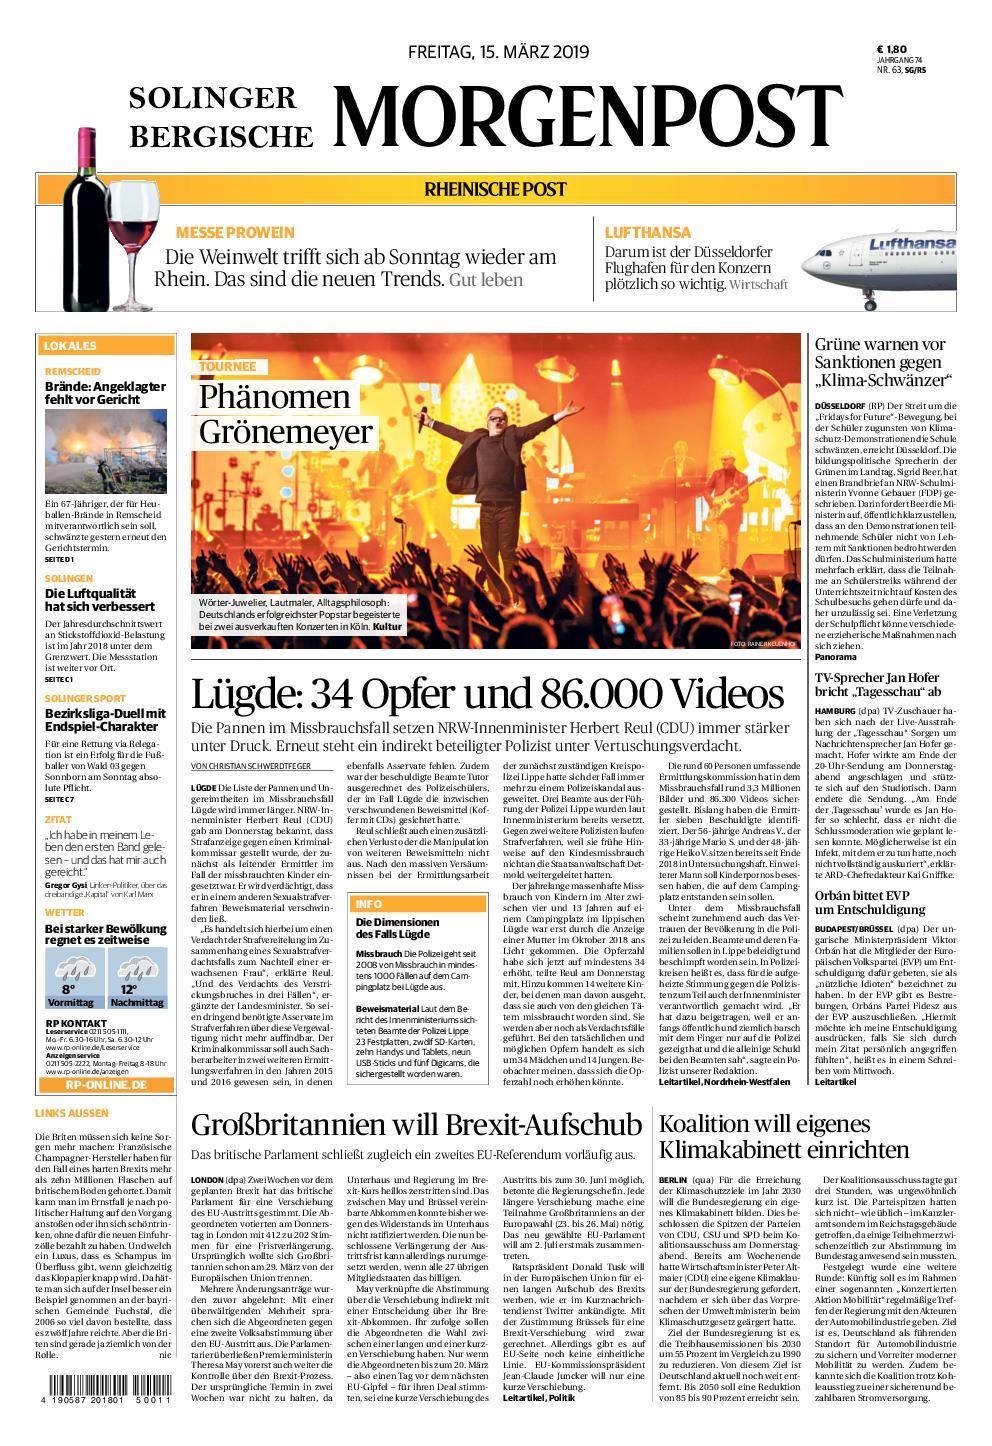 Solinger Morgenpost – 15. März 2019